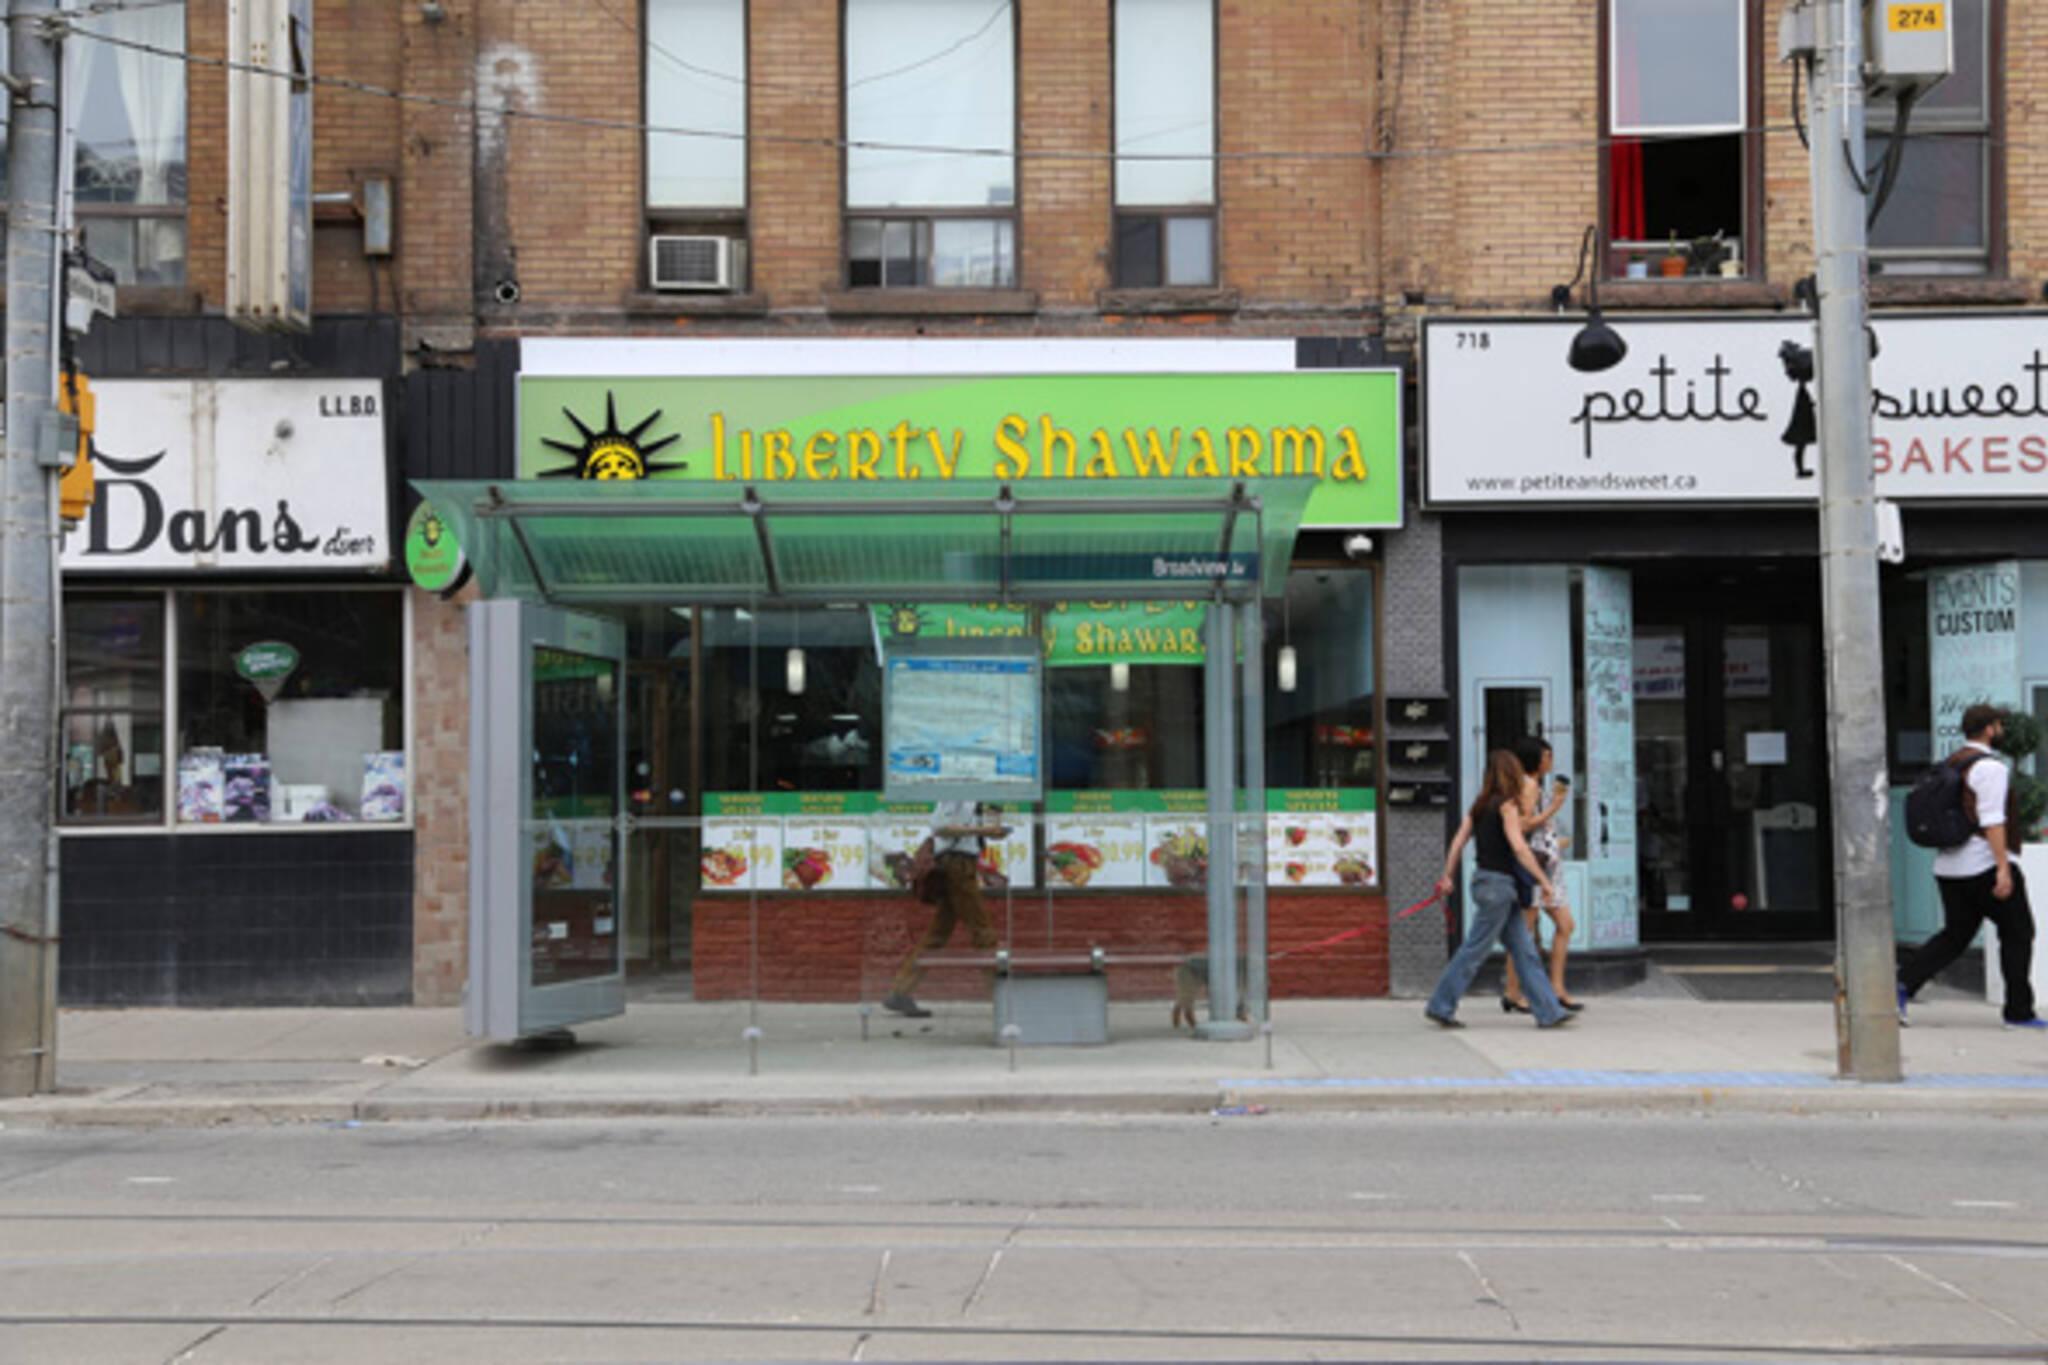 201379-liberty-shawarma.jpg